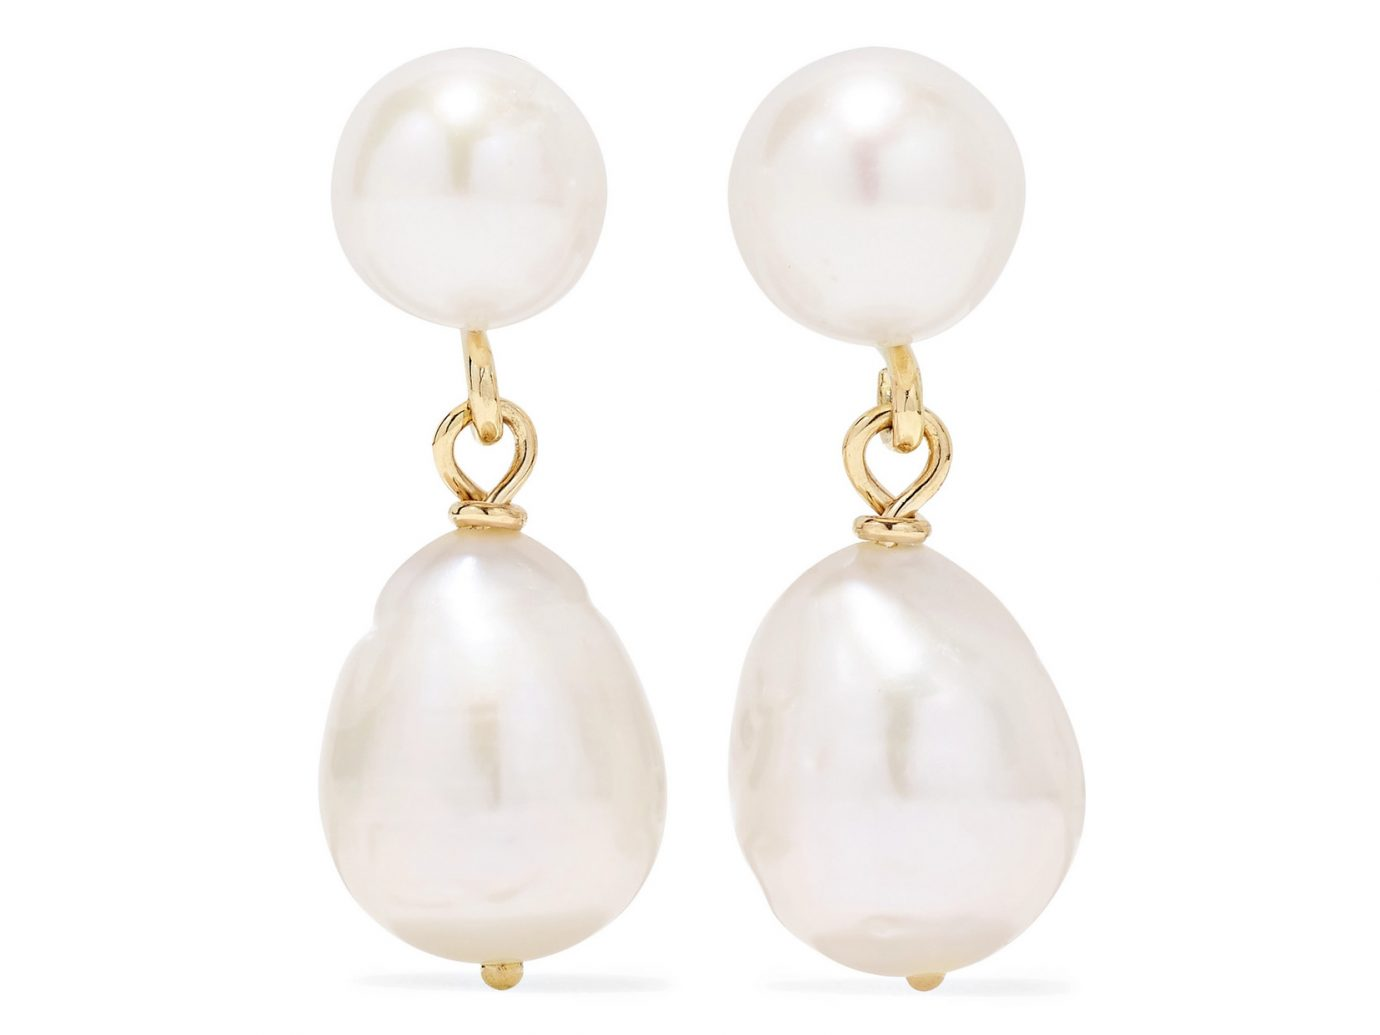 Natasha Schweitzer Mia gold pearl earrings